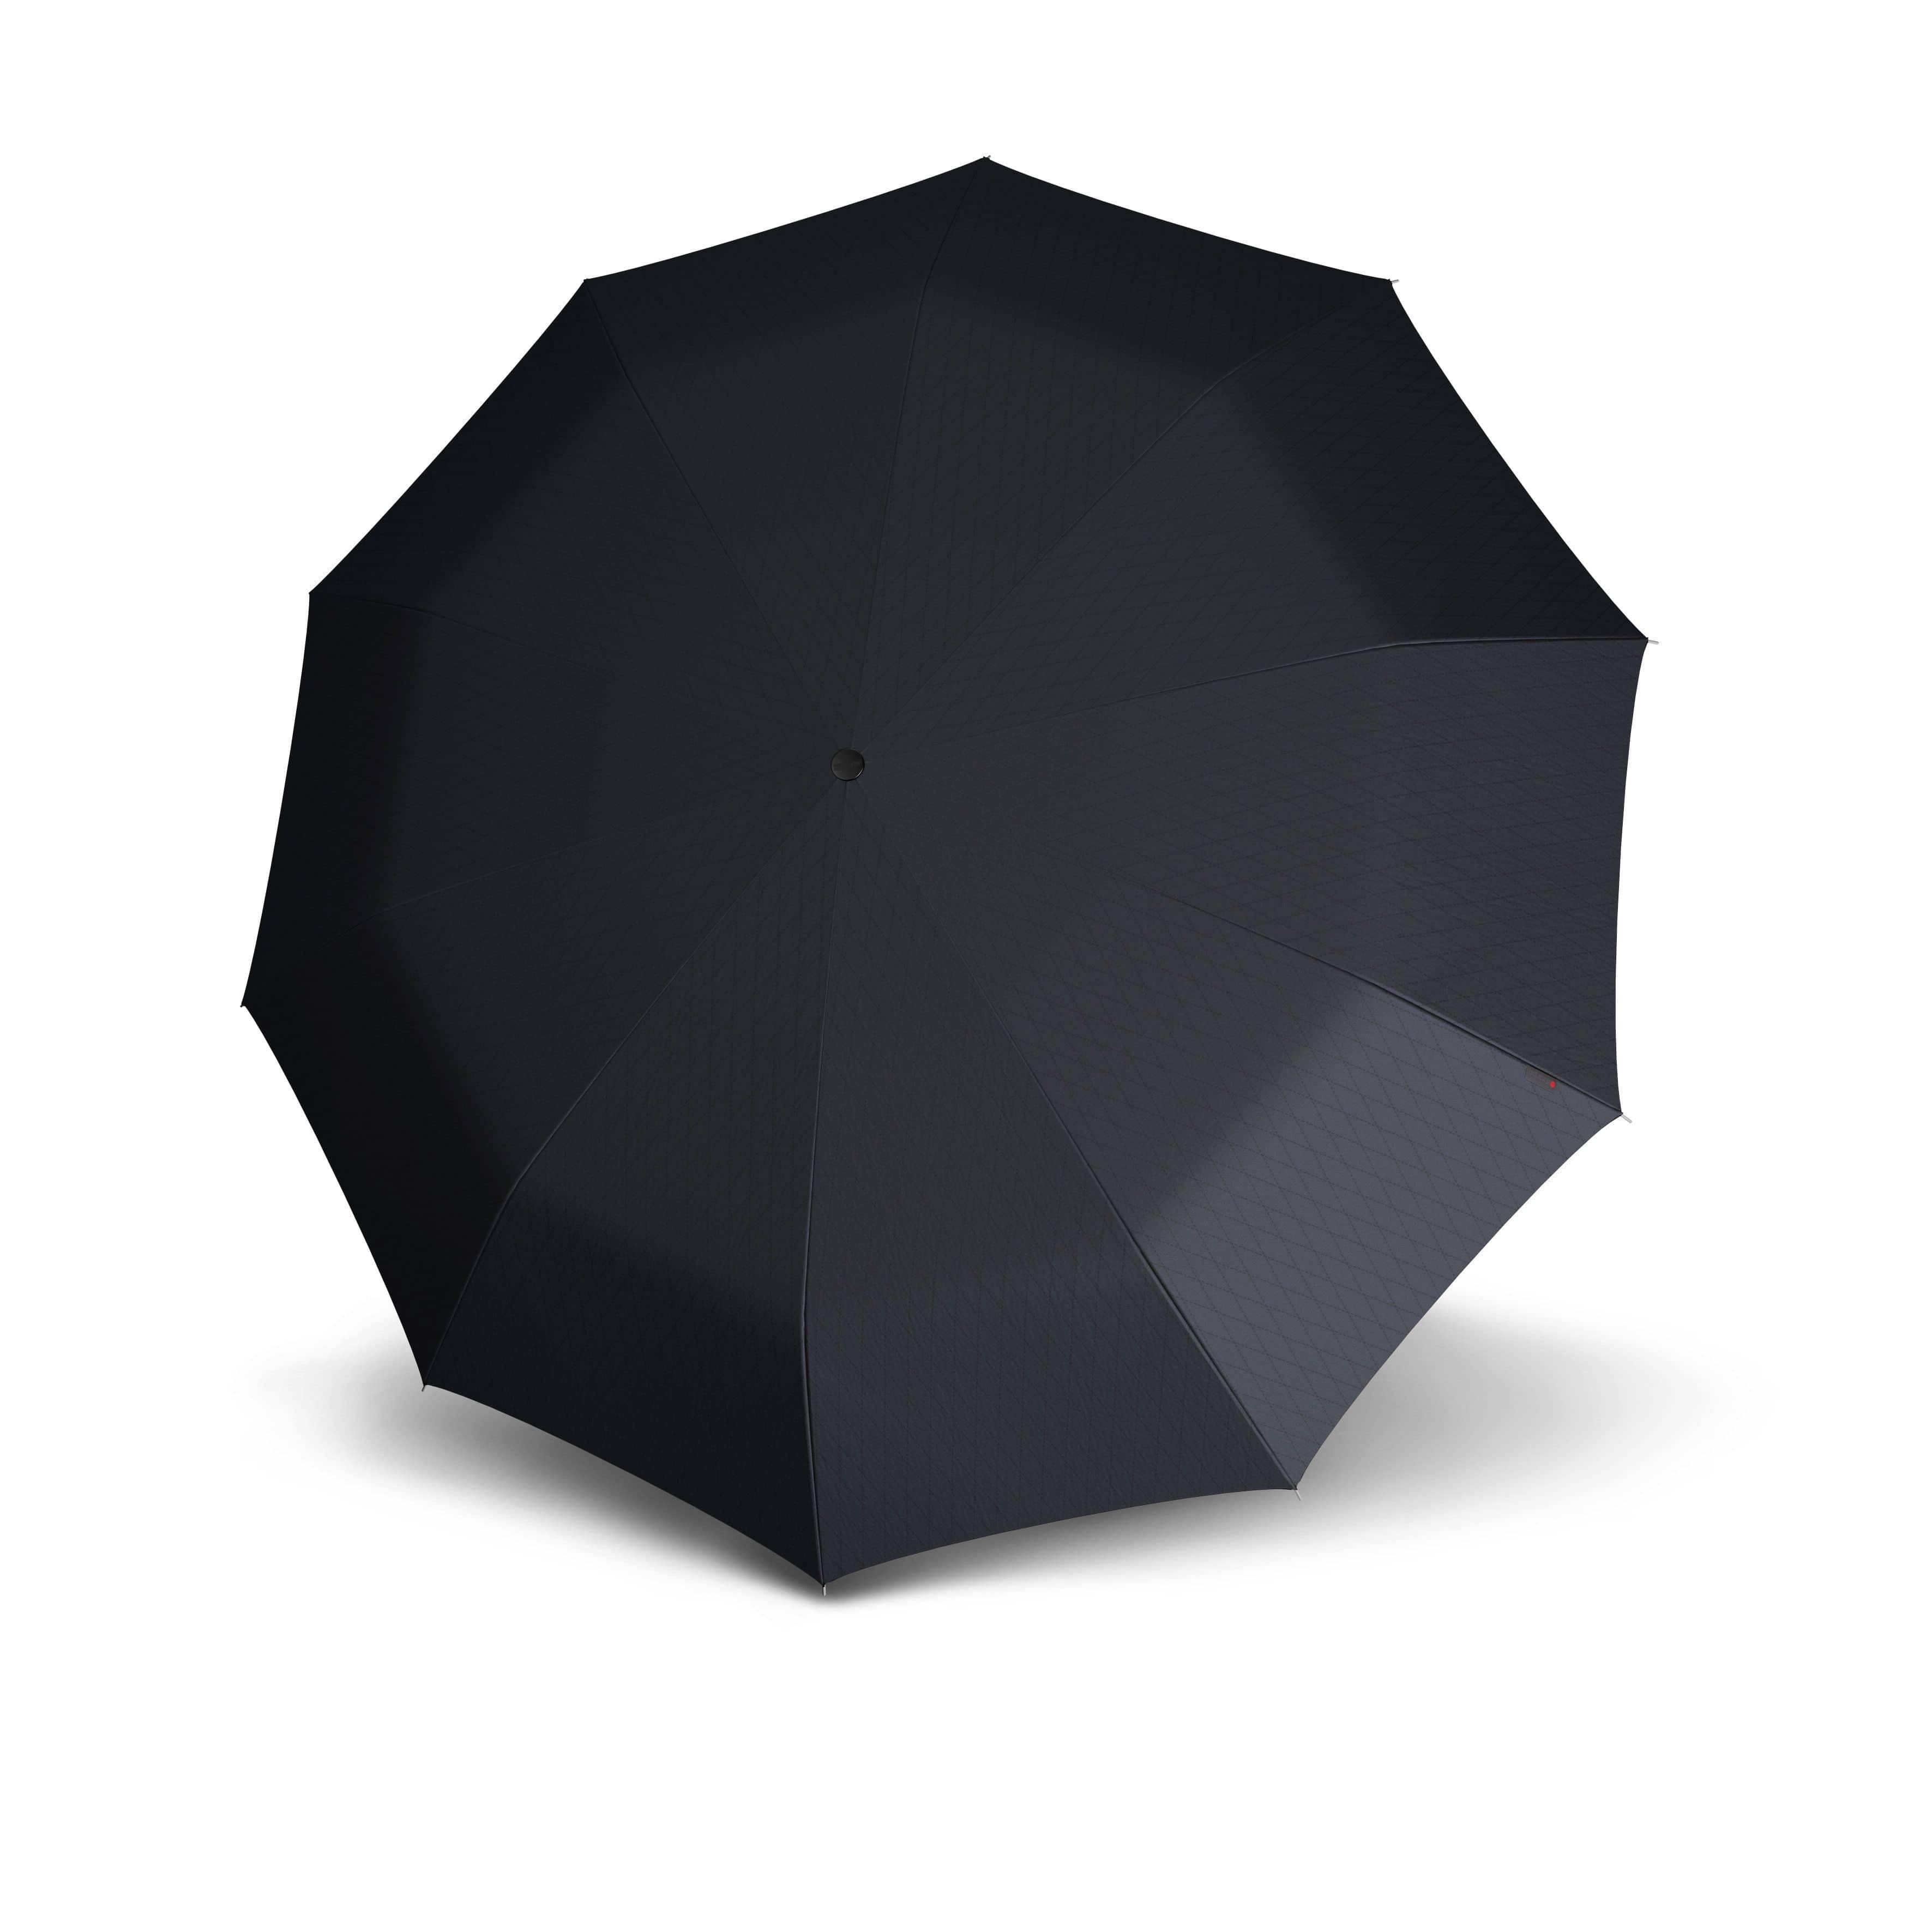 Knirps Umbrella T.771 long automatic - photo 2